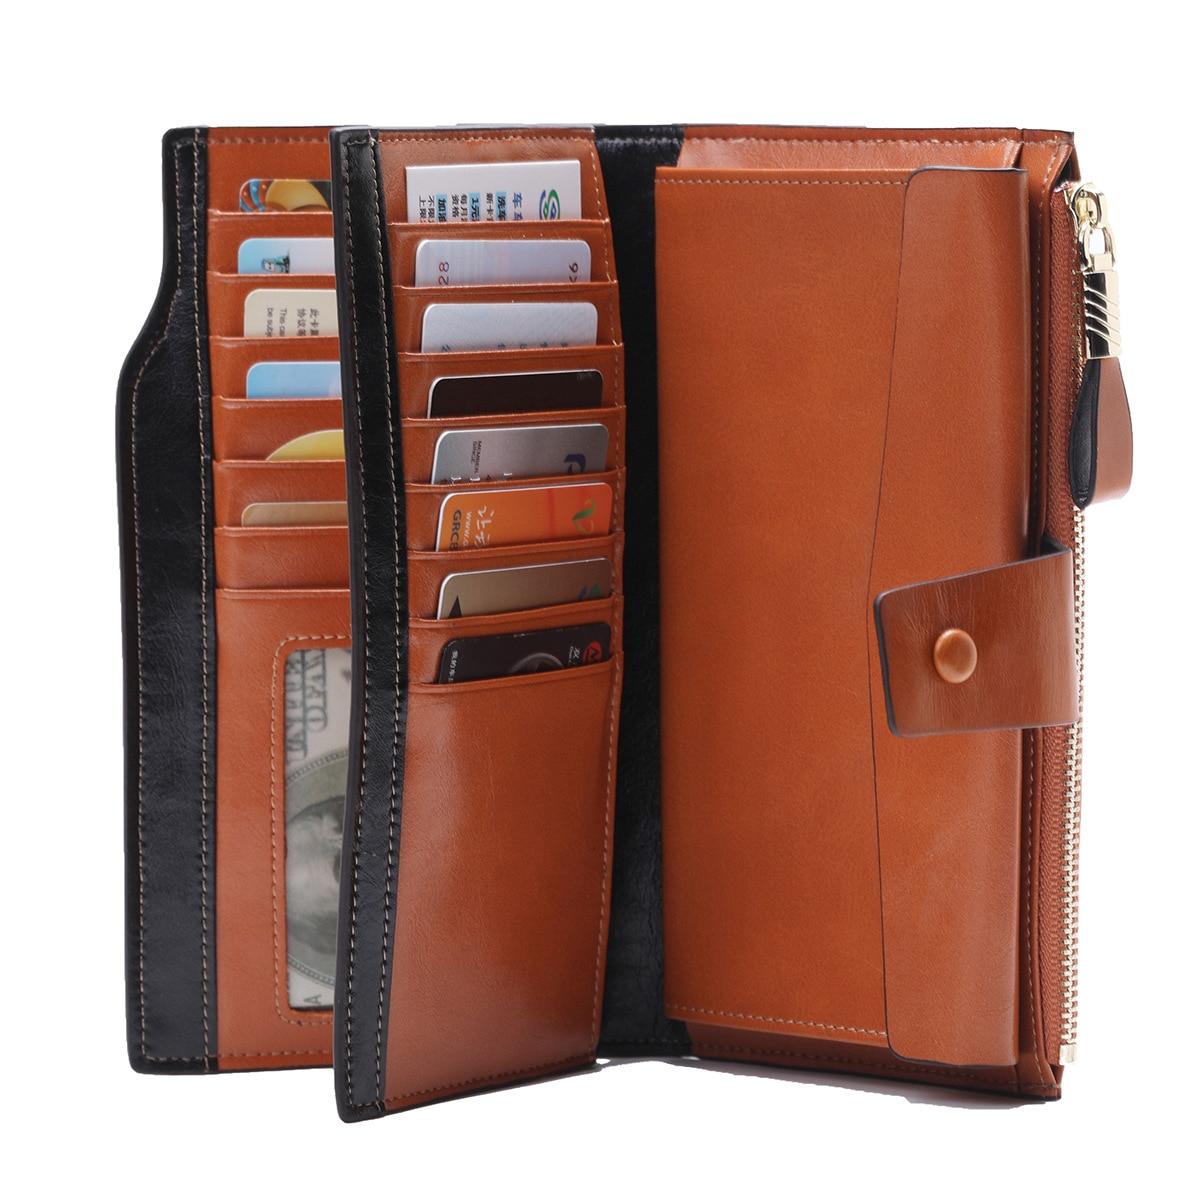 Cow Leather RFID Ladies Wallet Long Oil Wax Leather Cowhide Women's Multi-card Wallet Purse 781 Female Business Women's Handbag